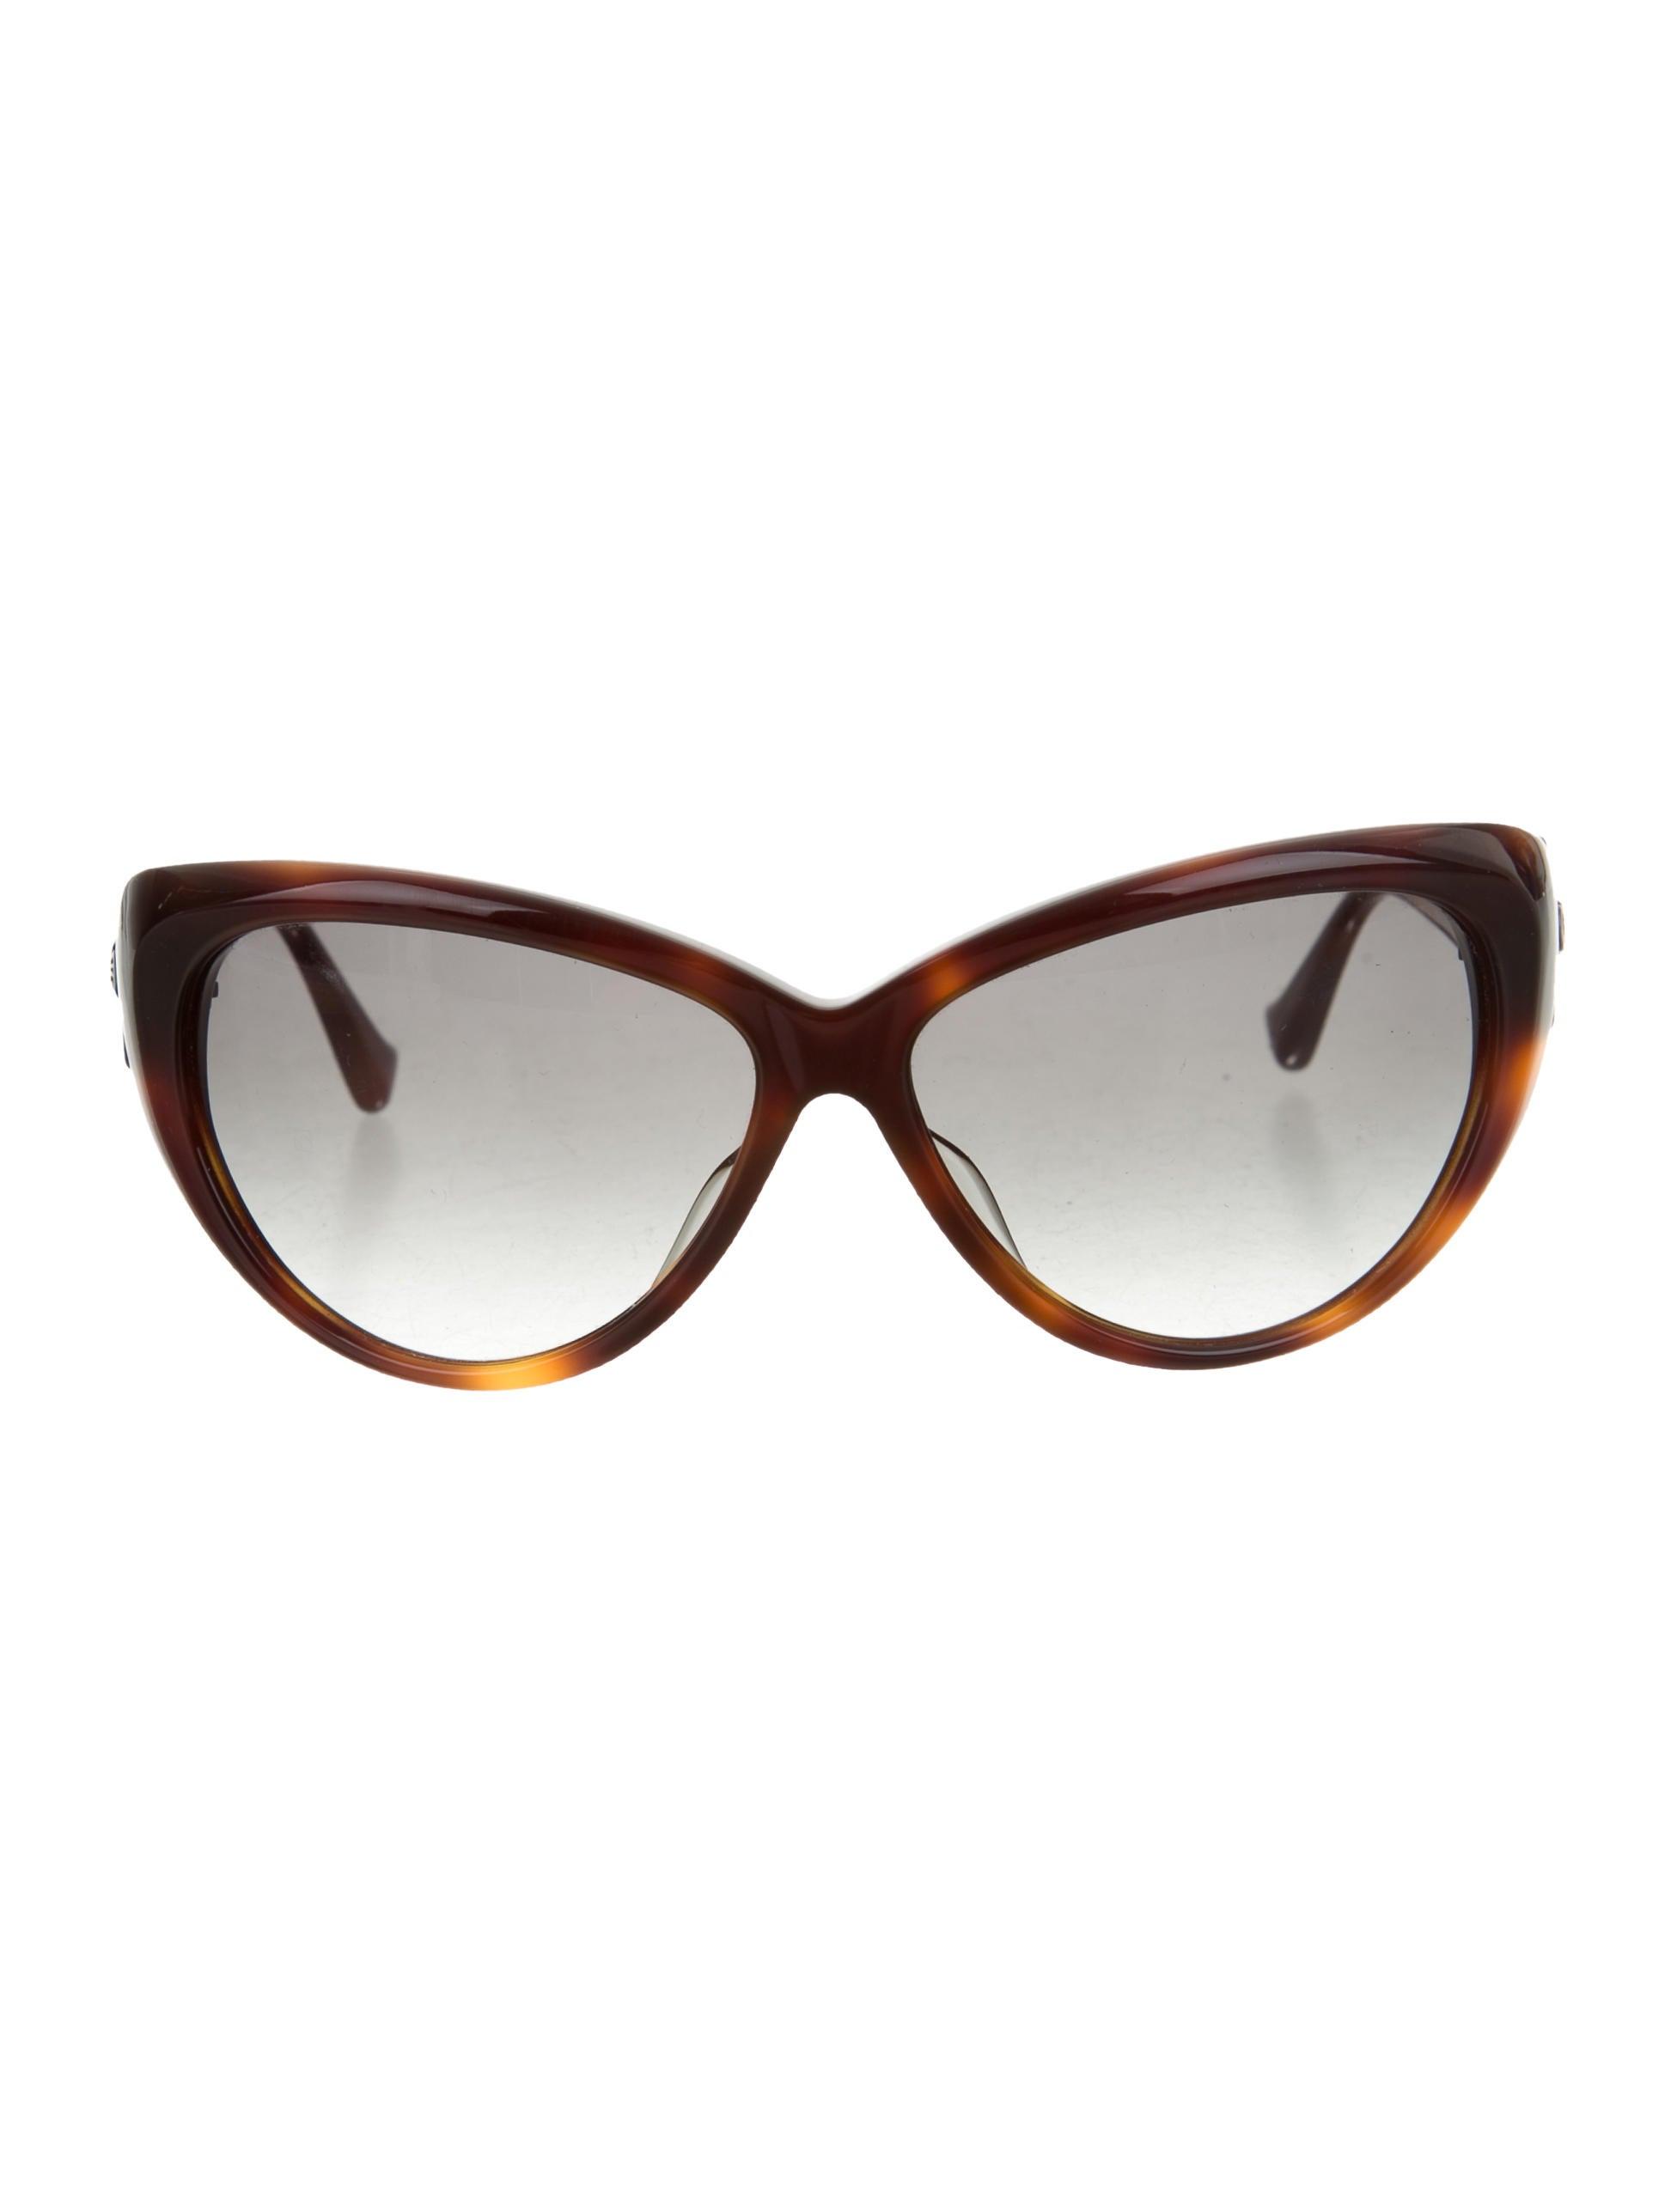 ea642817221c Chrome Hearts Club Sandwich Polarized Sunglasses - Accessories ...